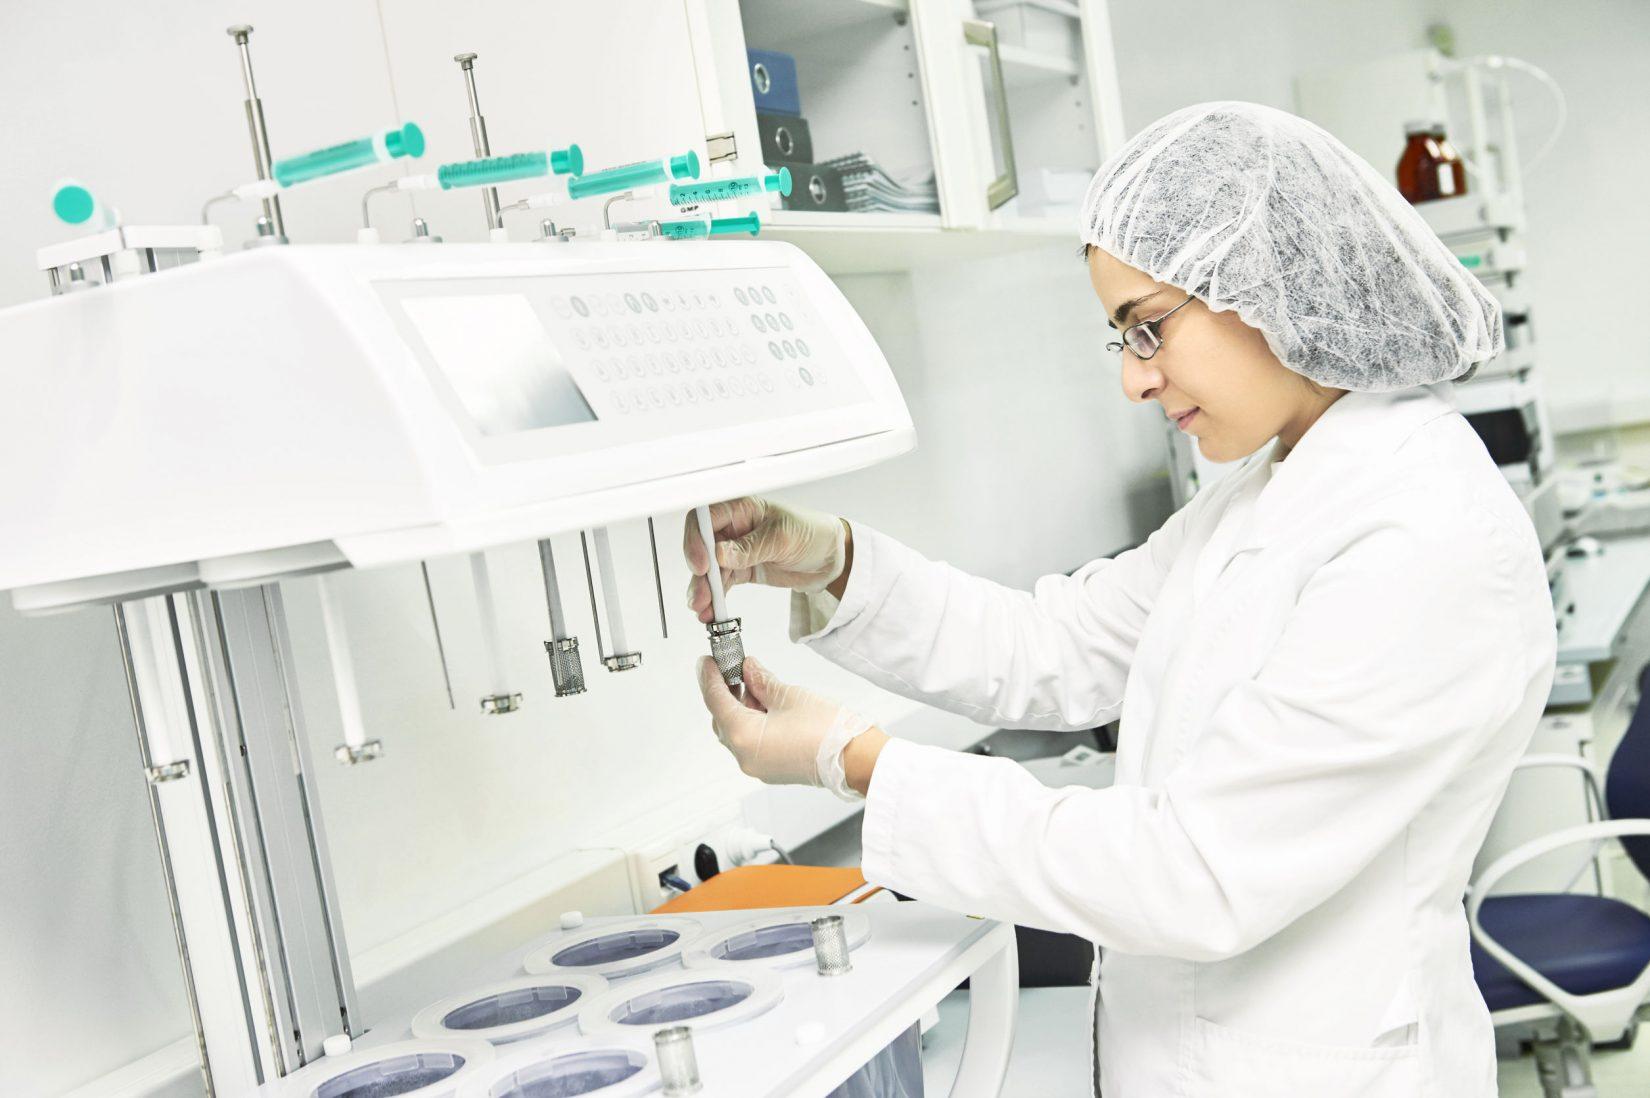 Lab tech filling up bottle